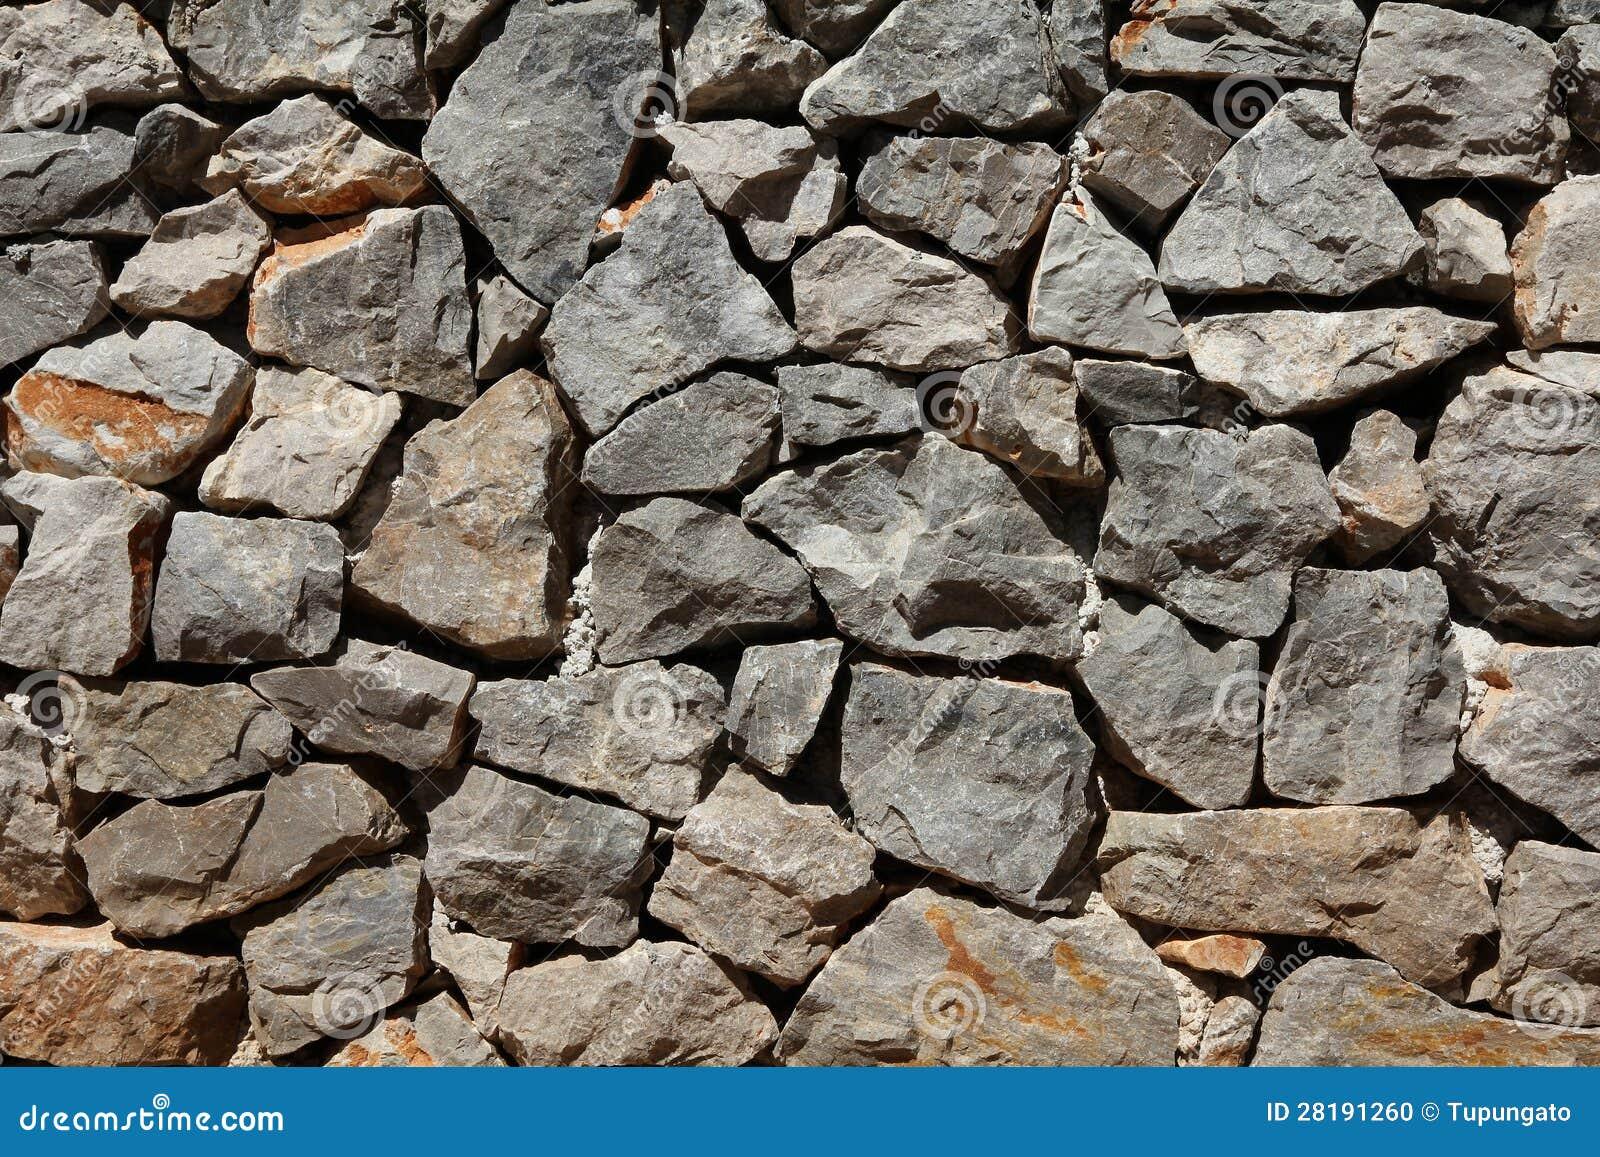 basalt rock wall stock photo image of wall pattern 28191260. Black Bedroom Furniture Sets. Home Design Ideas